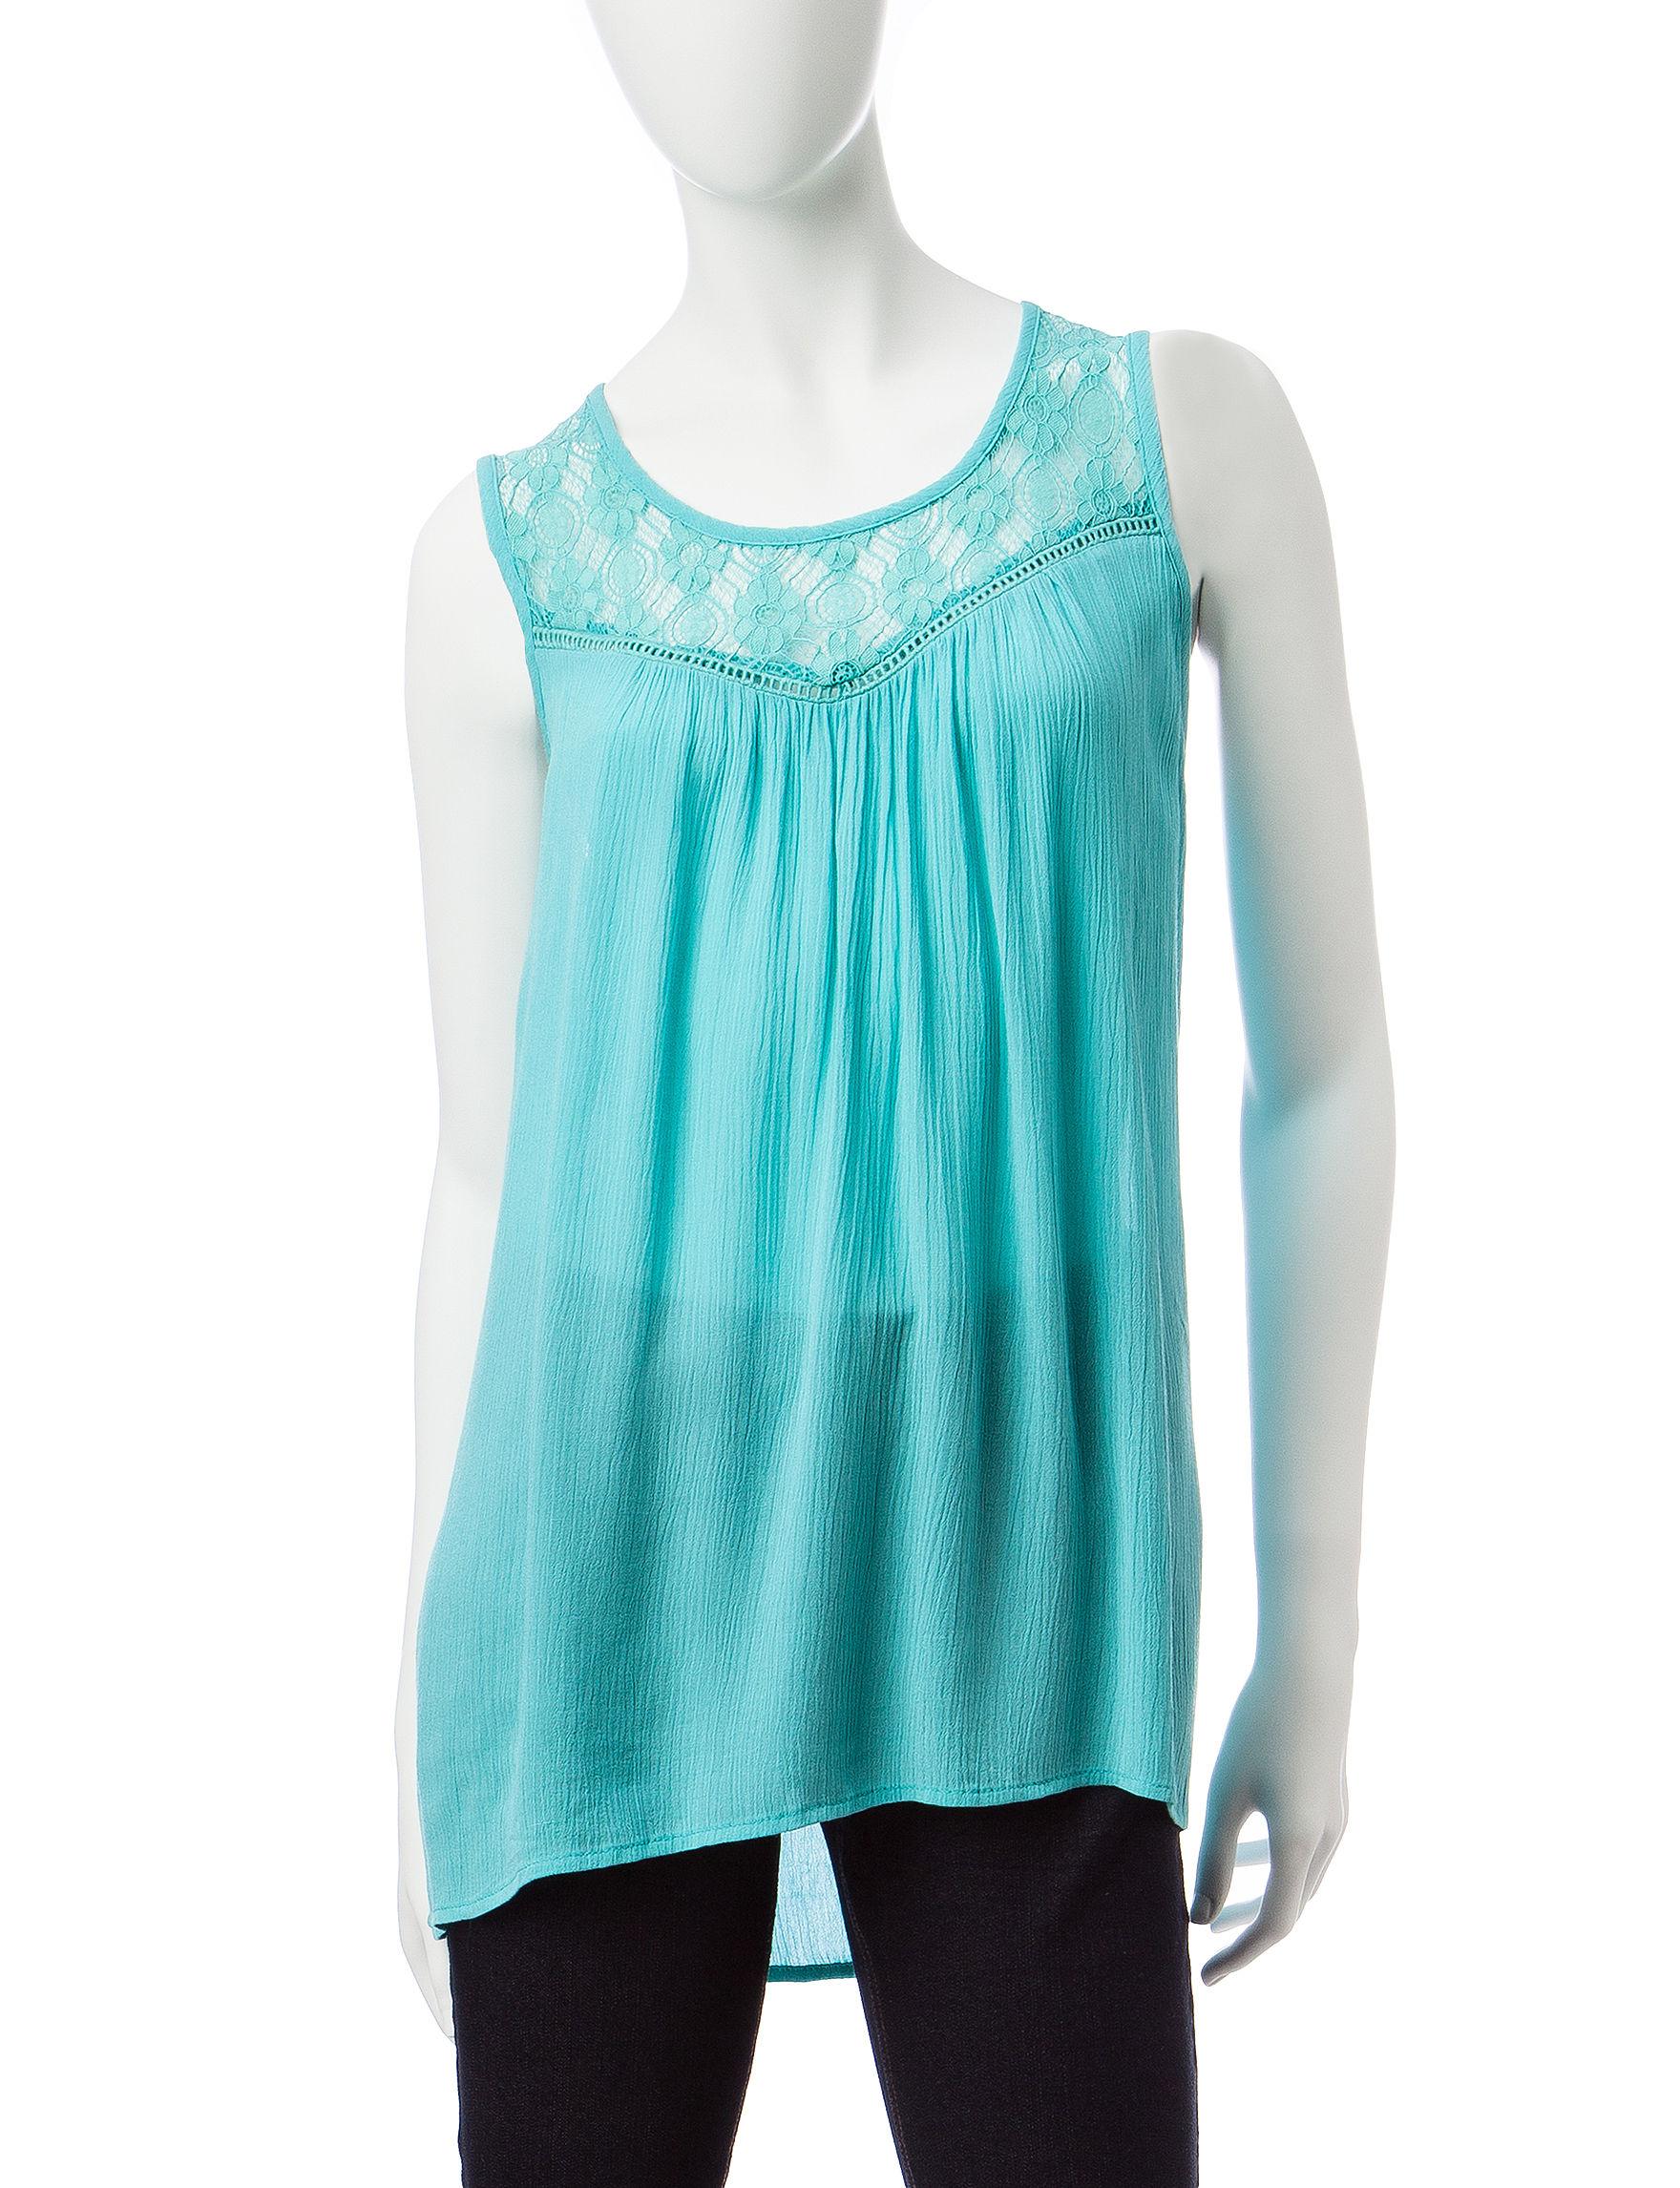 Signature Studio Turquoise Shirts & Blouses